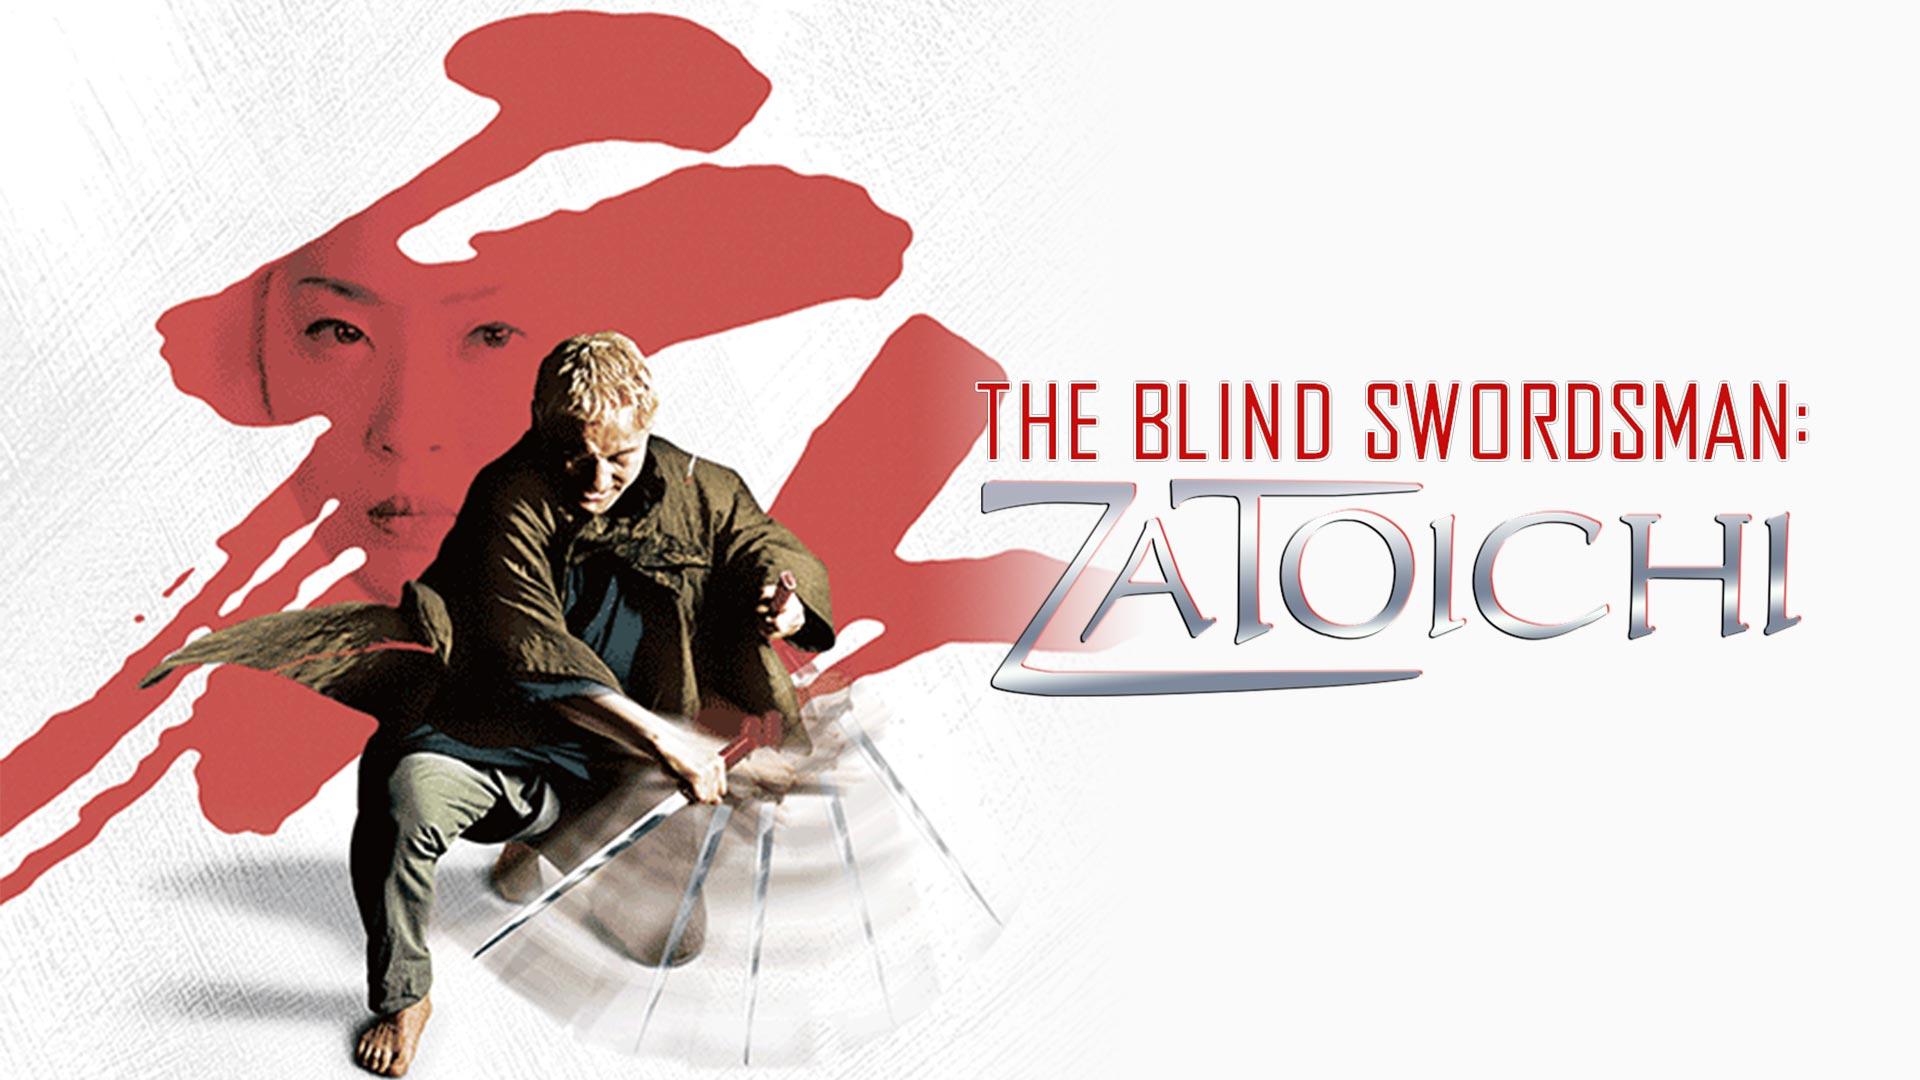 The Blind Swordsman: Zatoichi (English Subtitled)